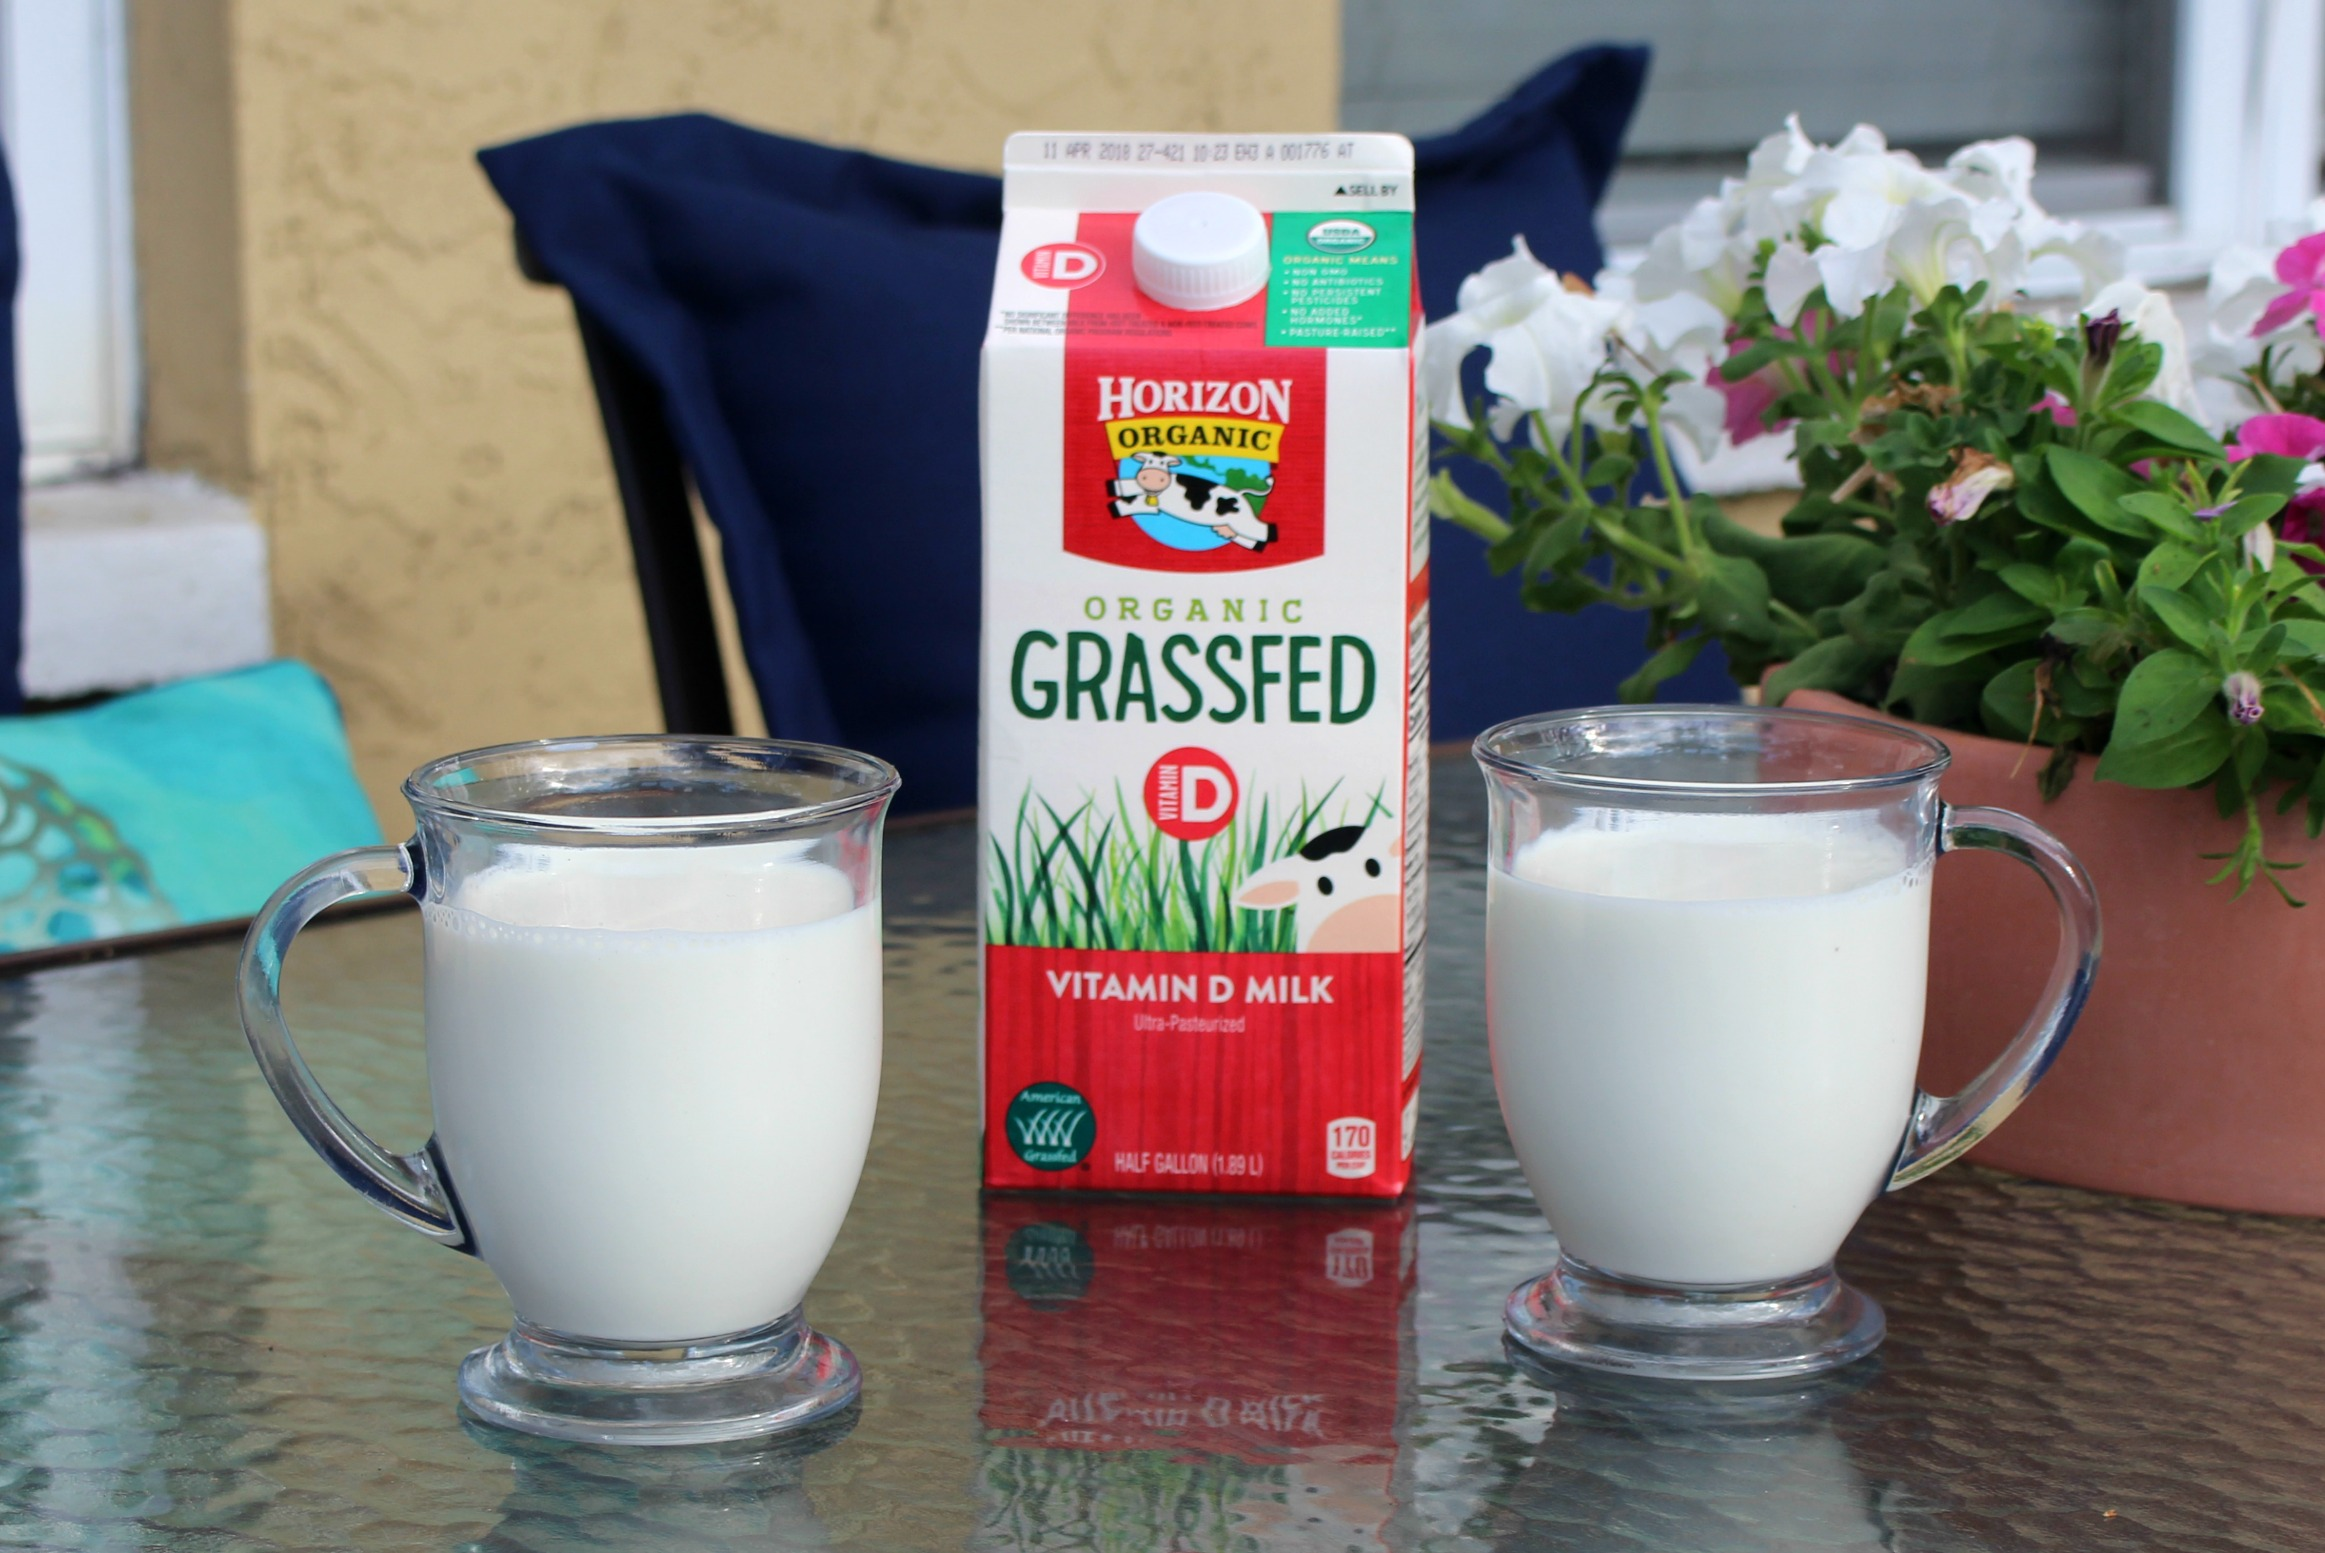 Organic-grassfed-horizon-milk-walmart